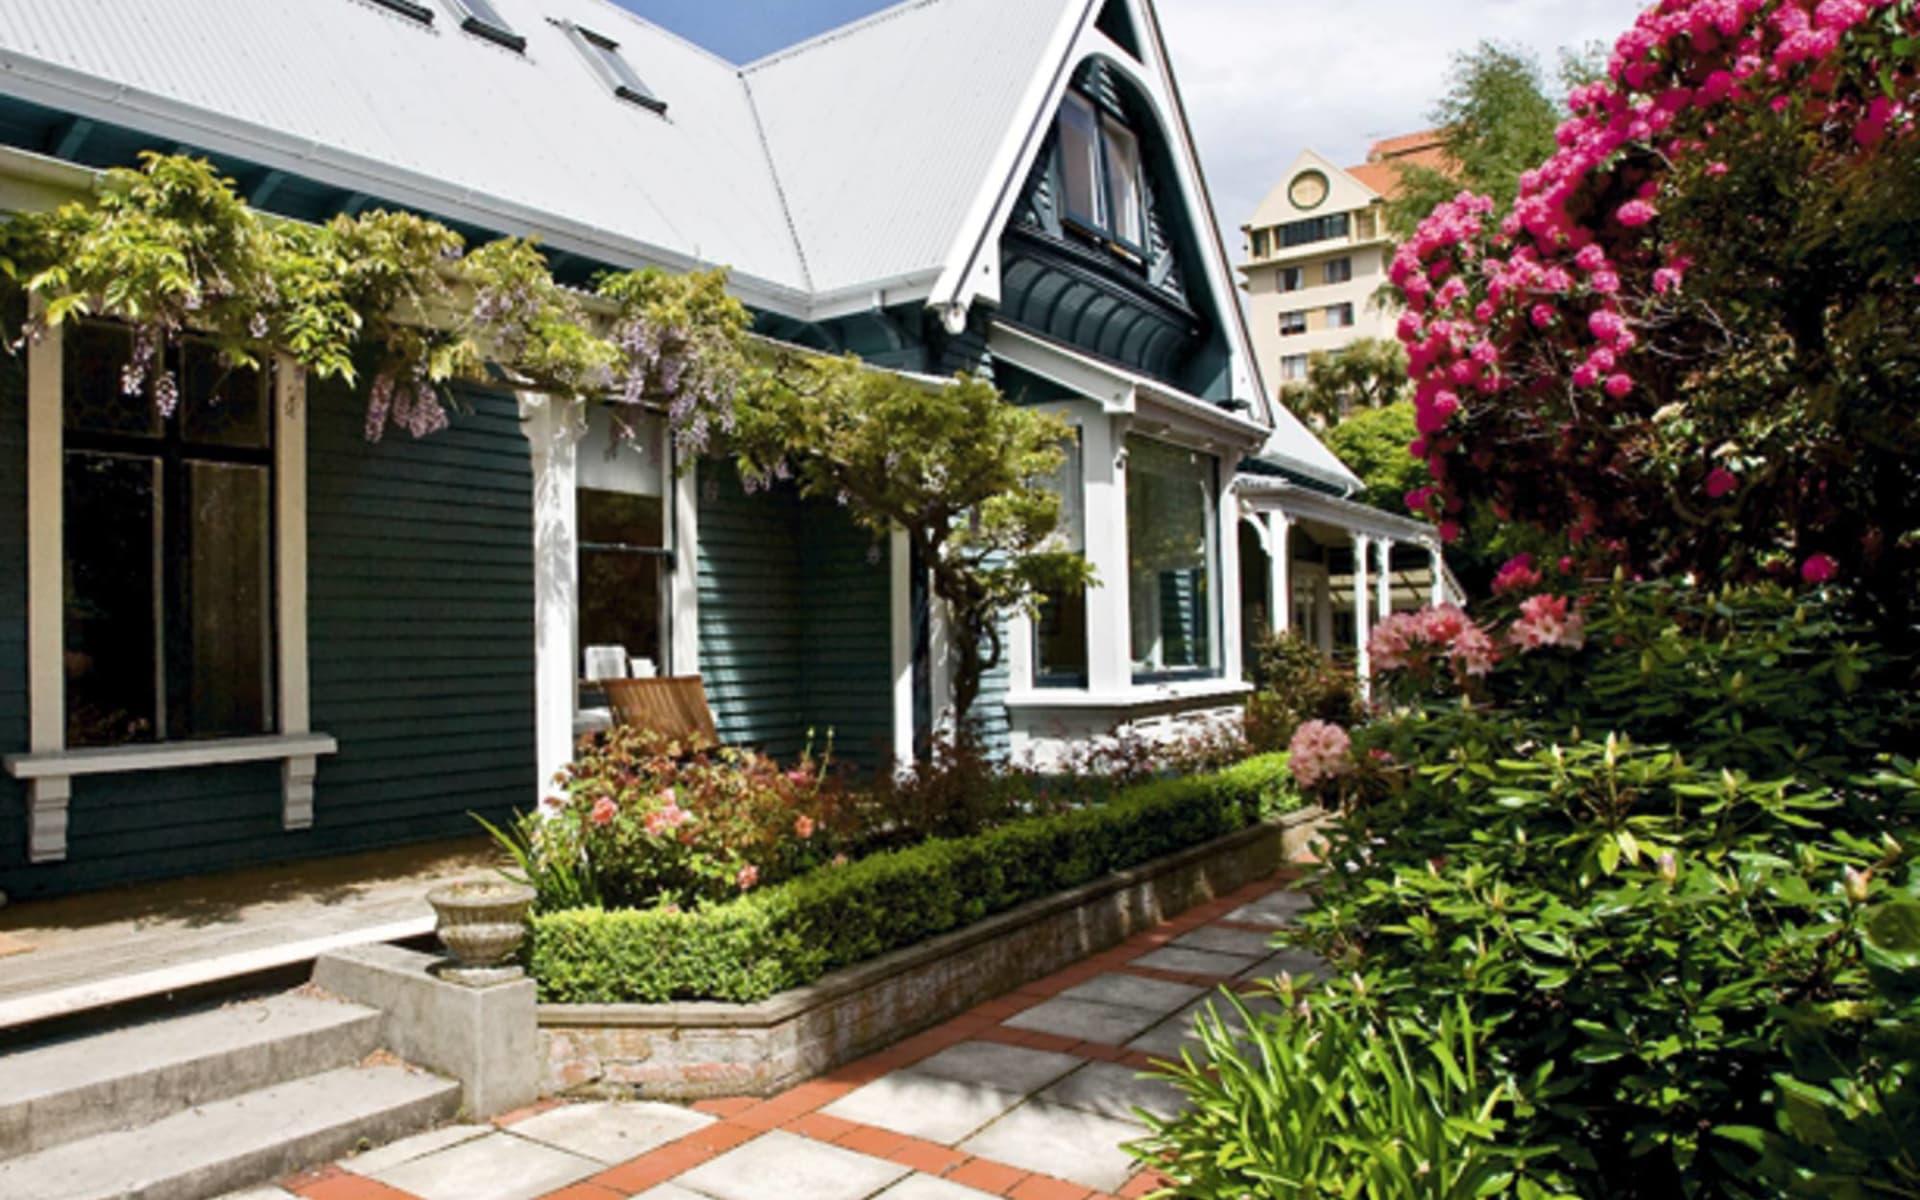 Orari B&B in Christchurch: Orari B&B - Hauptgebäude